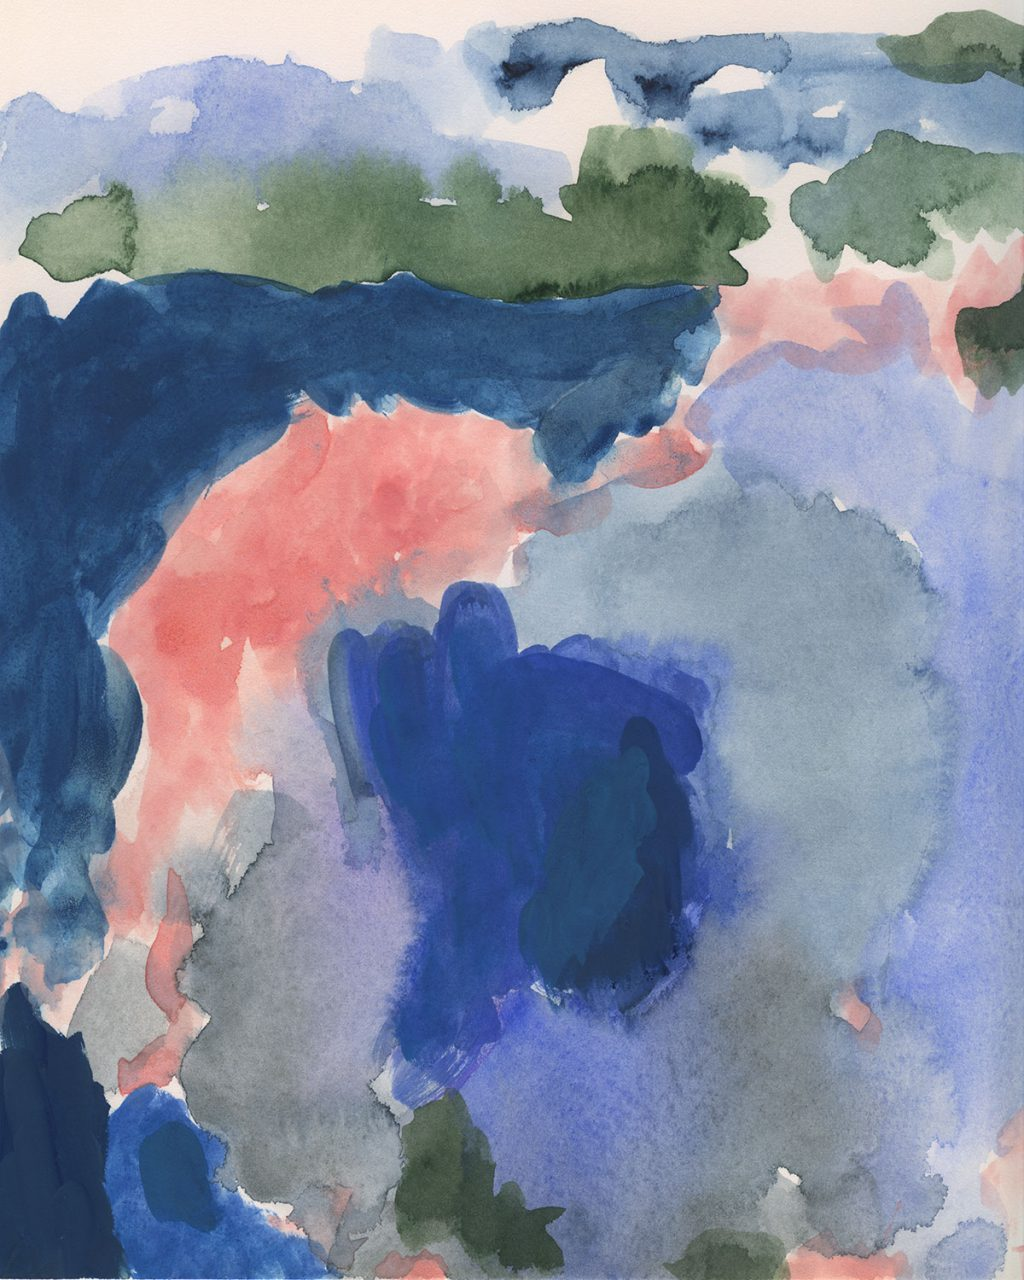 watercolor-blue-pink-green-unframed